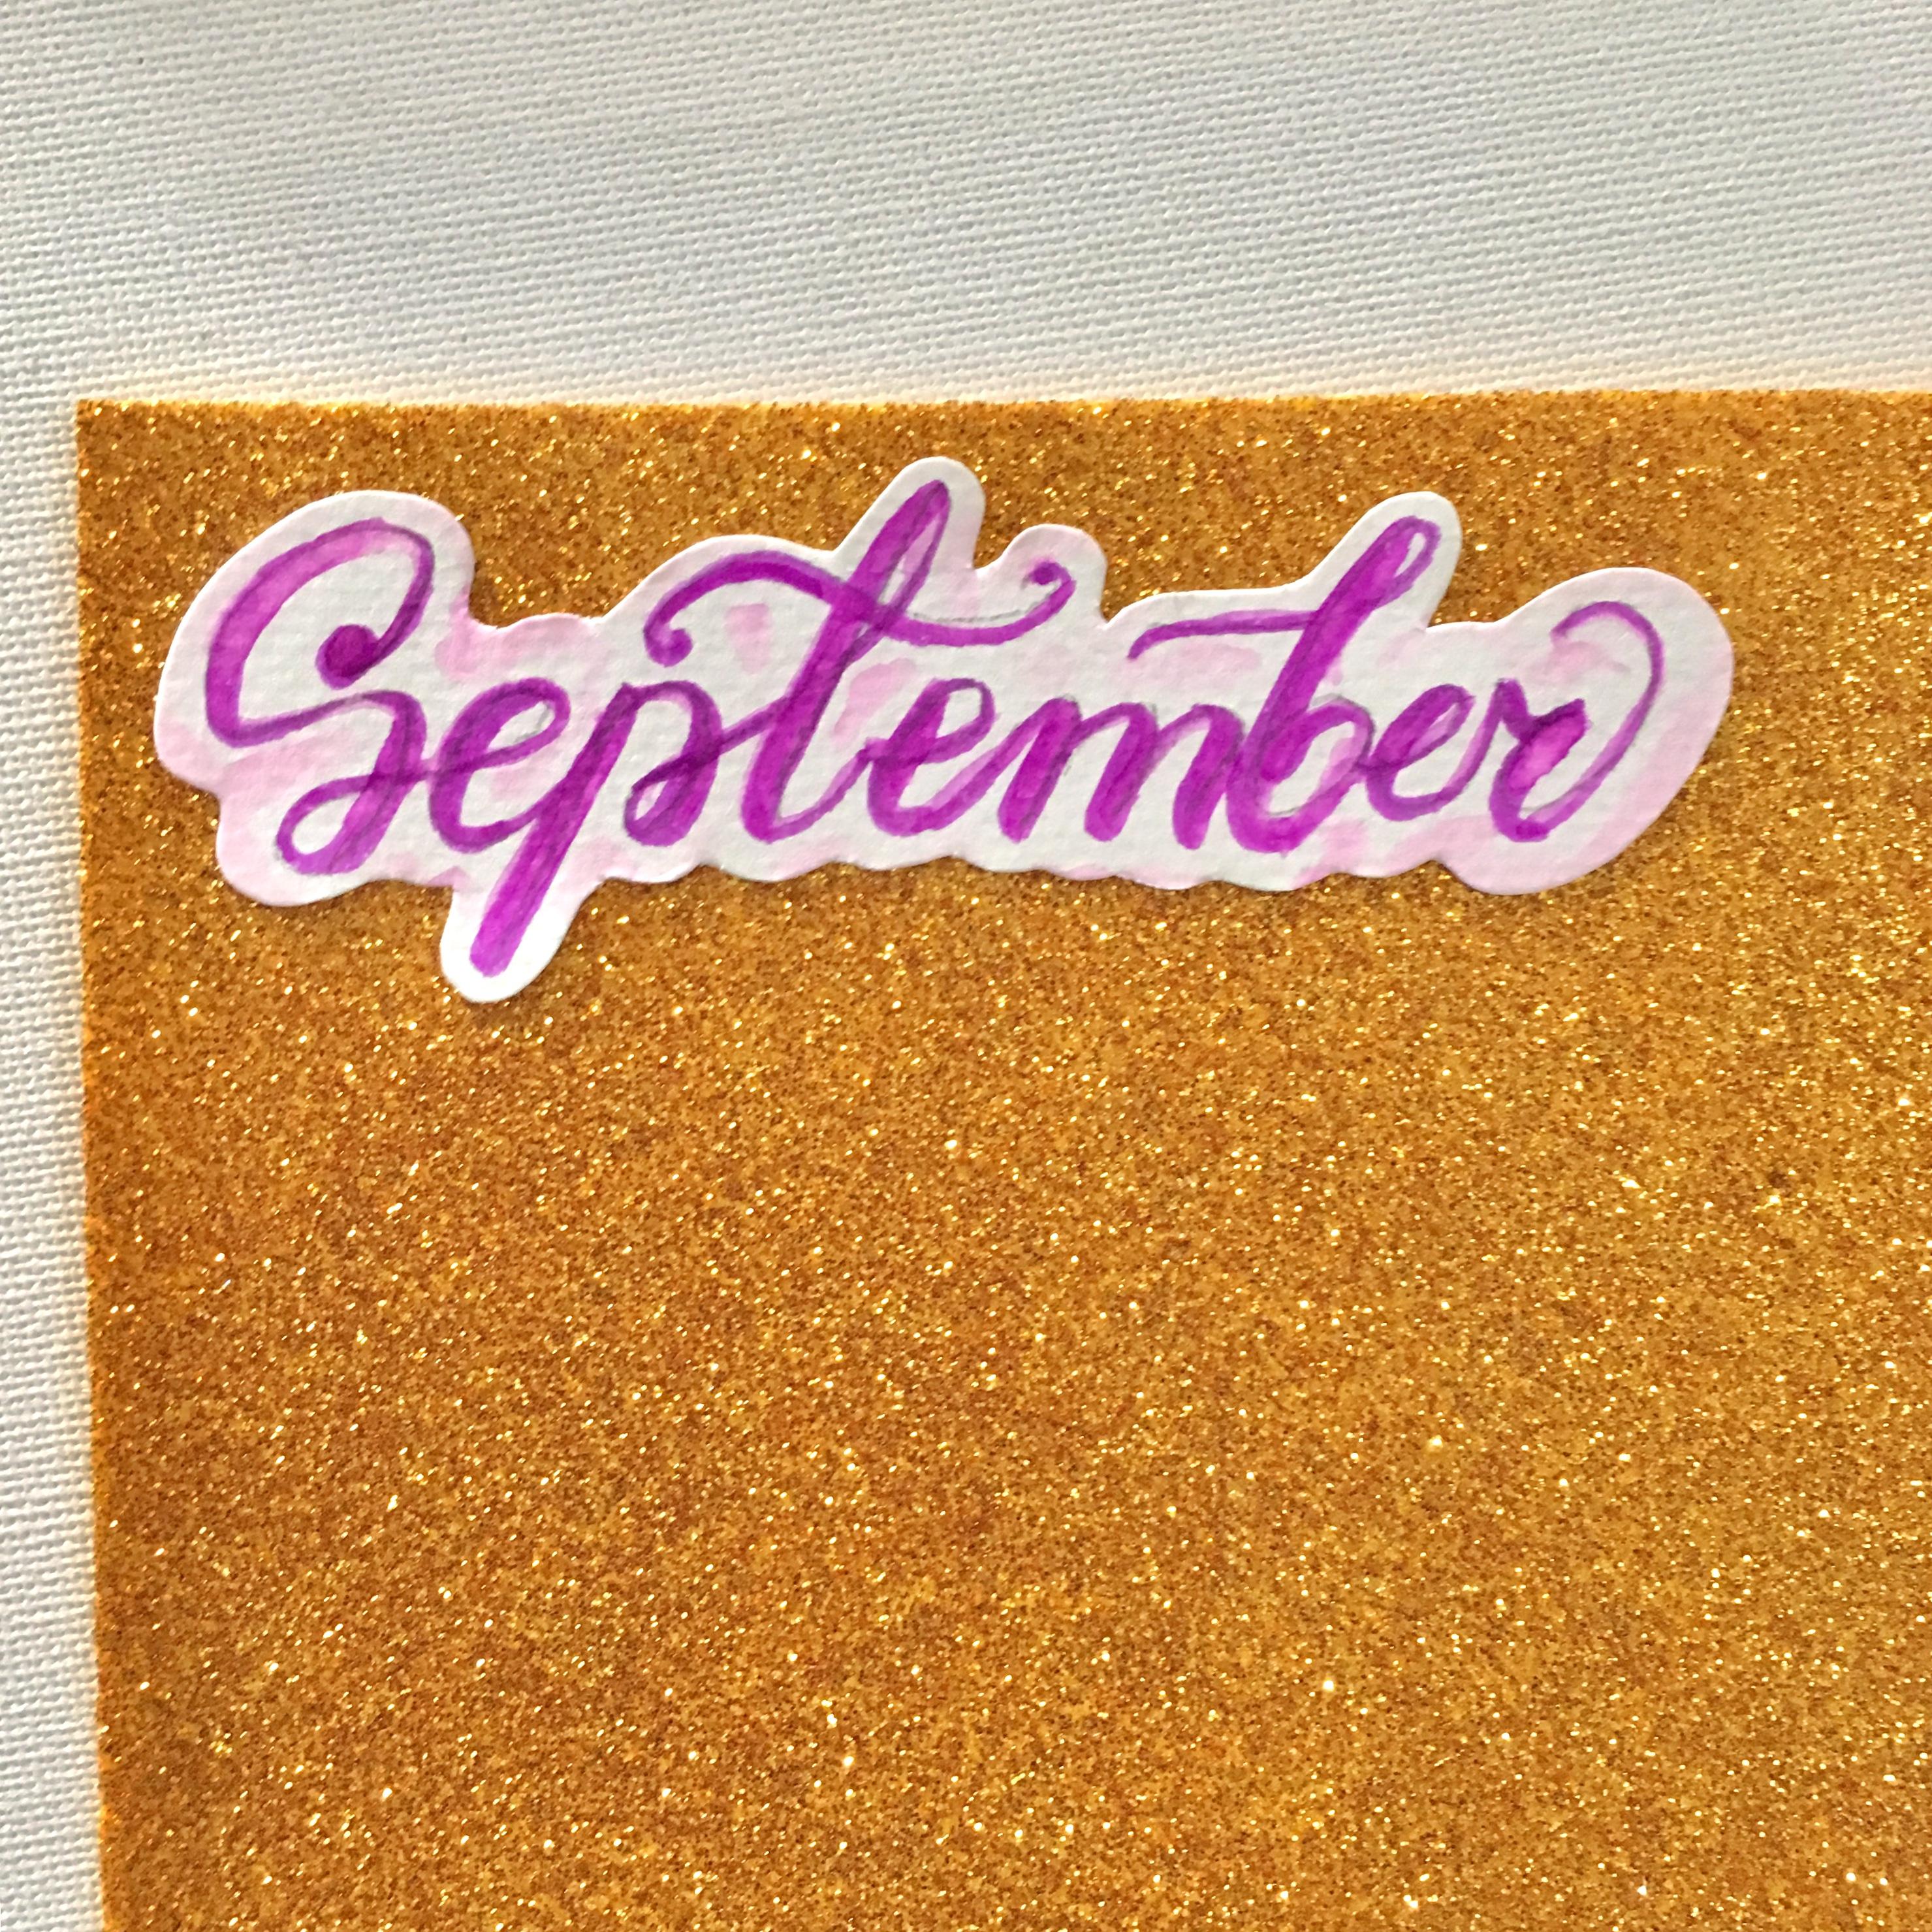 the purple handwritten sign September, glued on a glitter foam